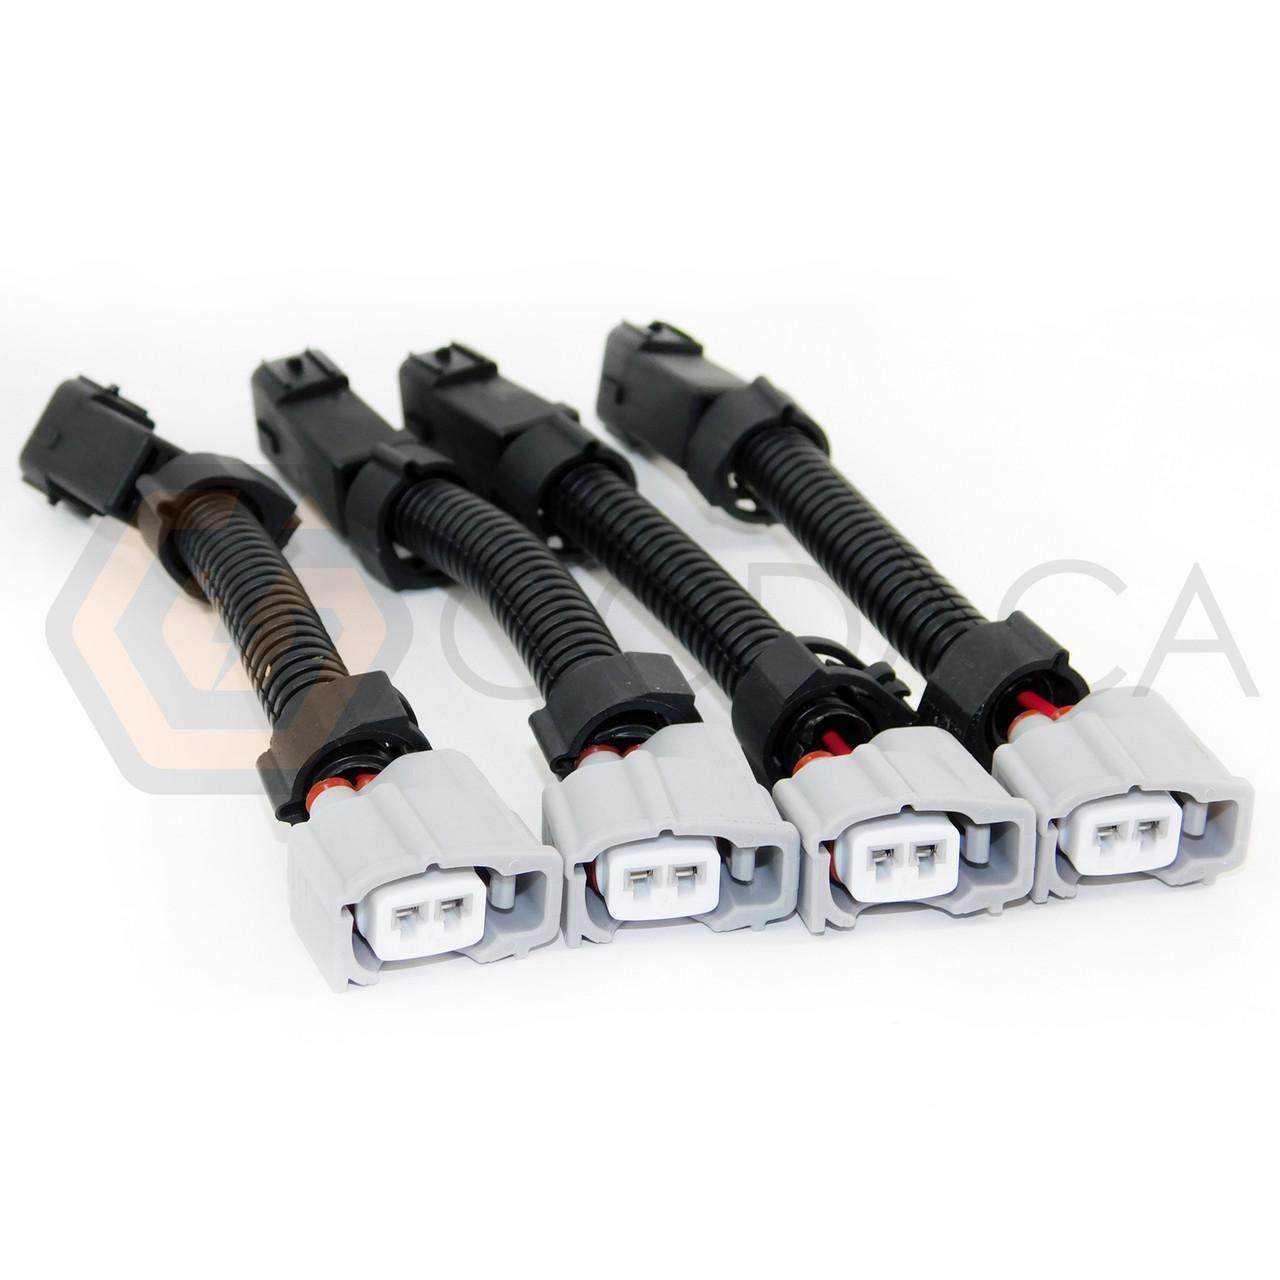 4x wiring harness adapter for fuel injector toyota to obd2 honda rh godaca com